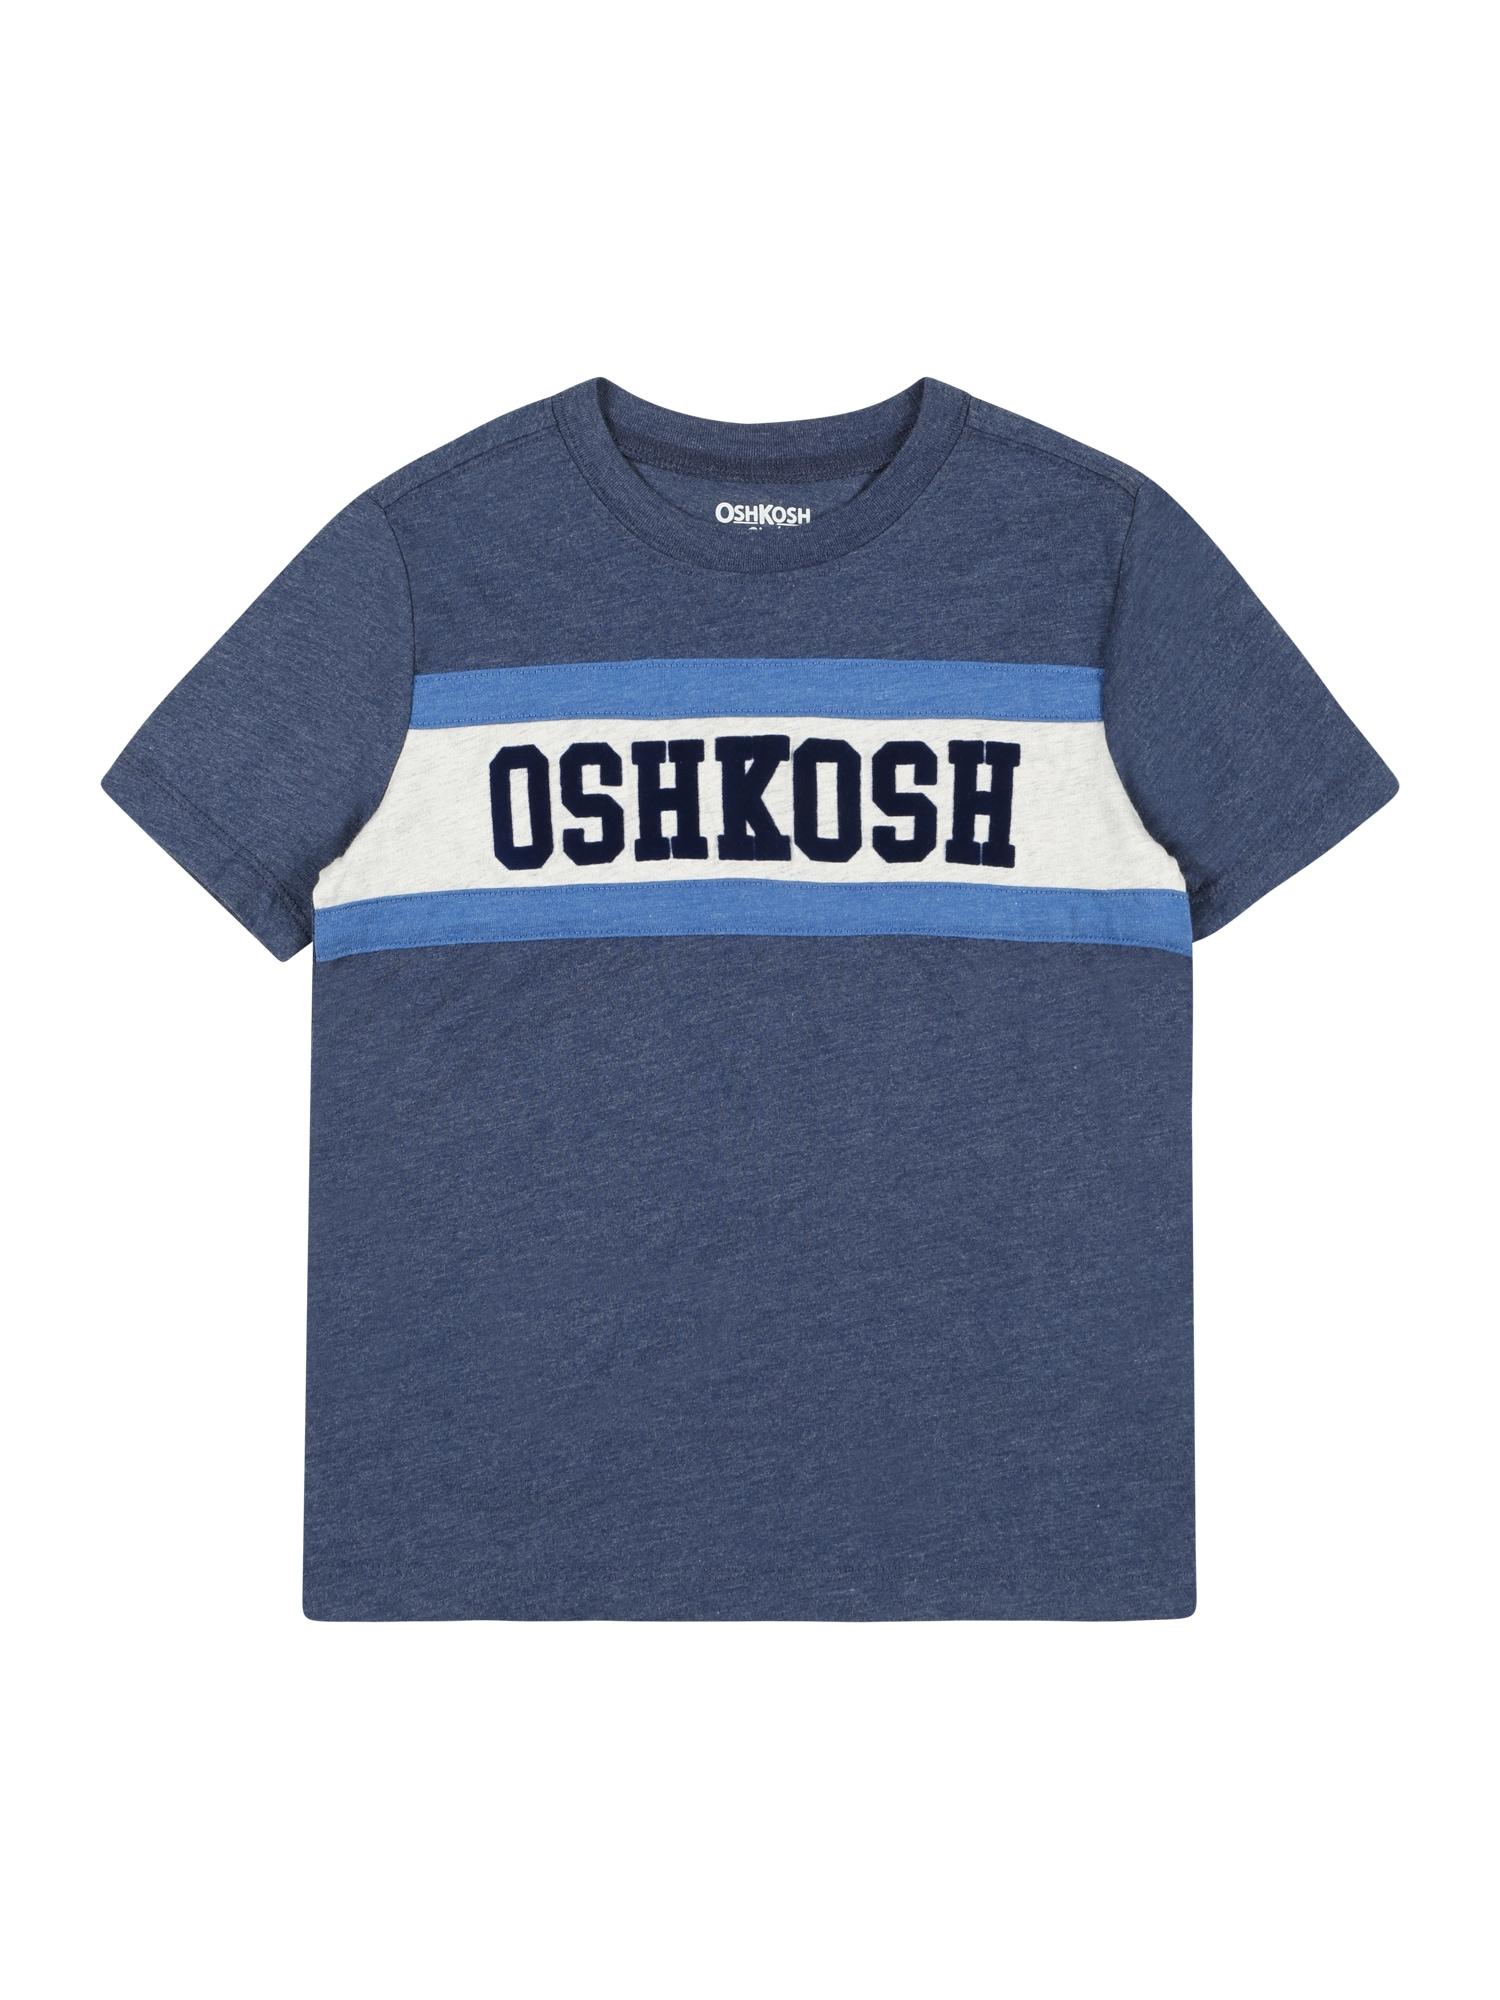 OshKosh Marškinėliai mėlyna / balta / tamsiai mėlyna